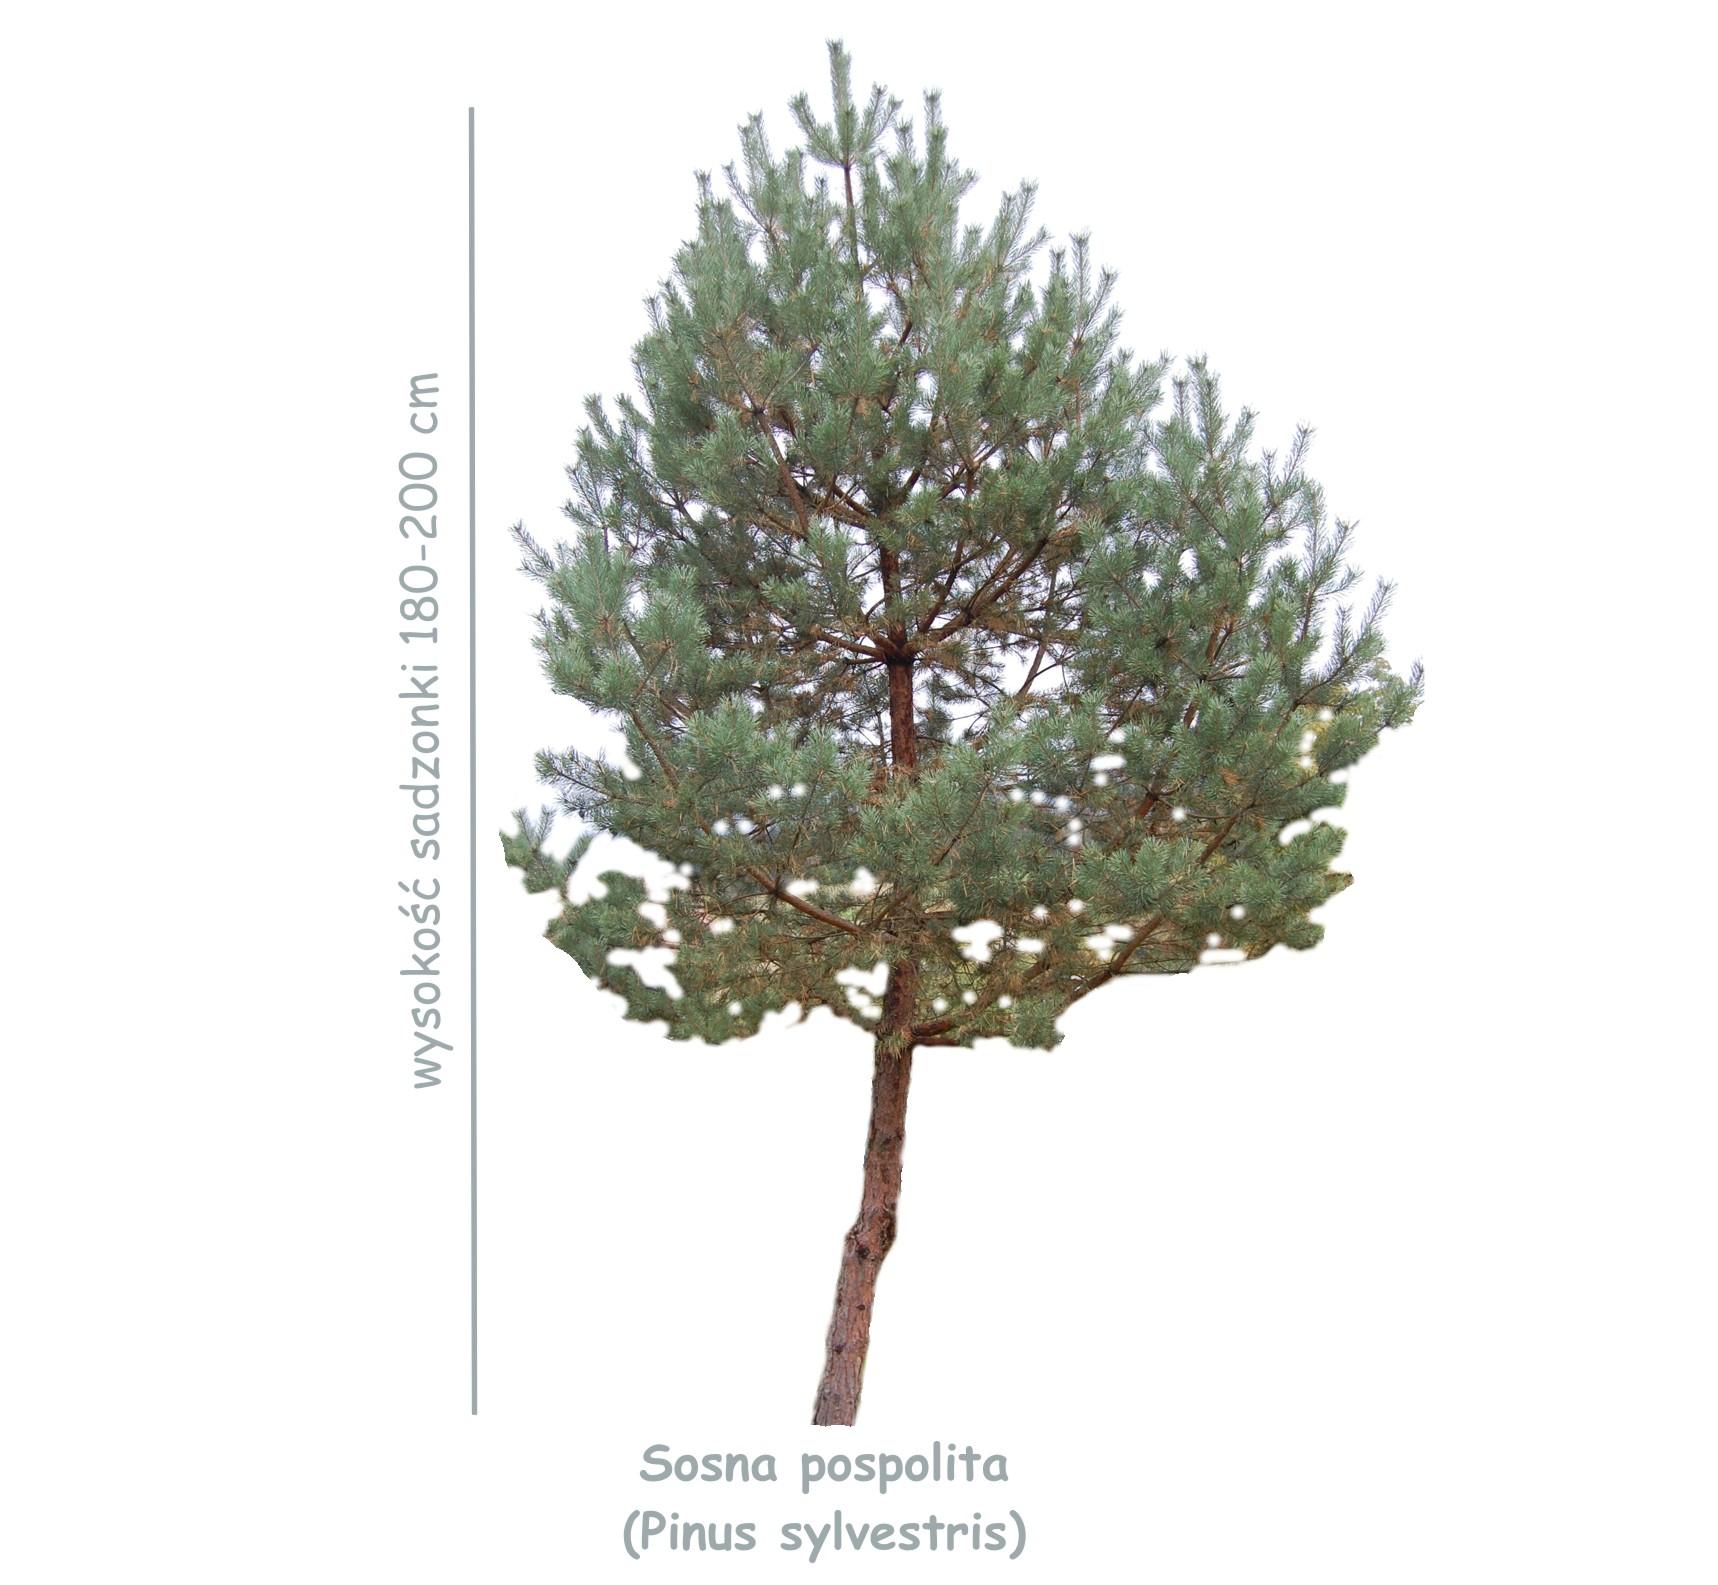 Sosna pospolita (Pinus sylvestris) sadzonka o wysokości 180-200 cm